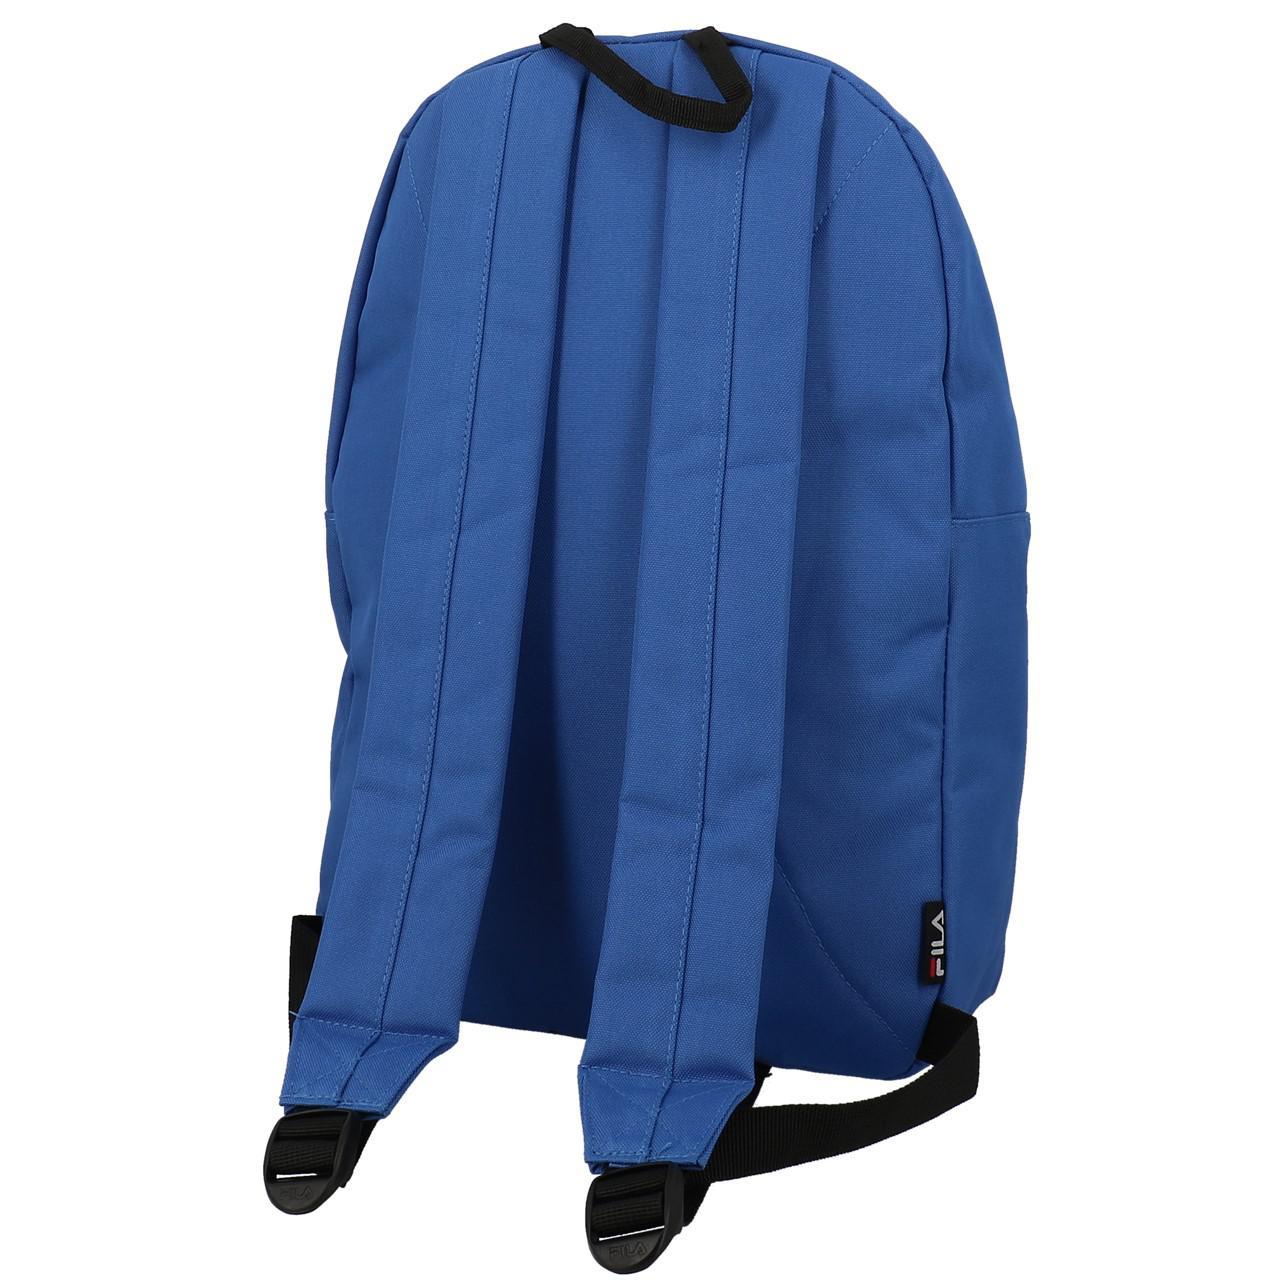 Sac-a-dos-college-Fila-Backpack-sxcool-bleu-Bleu-48131-Neuf miniature 5